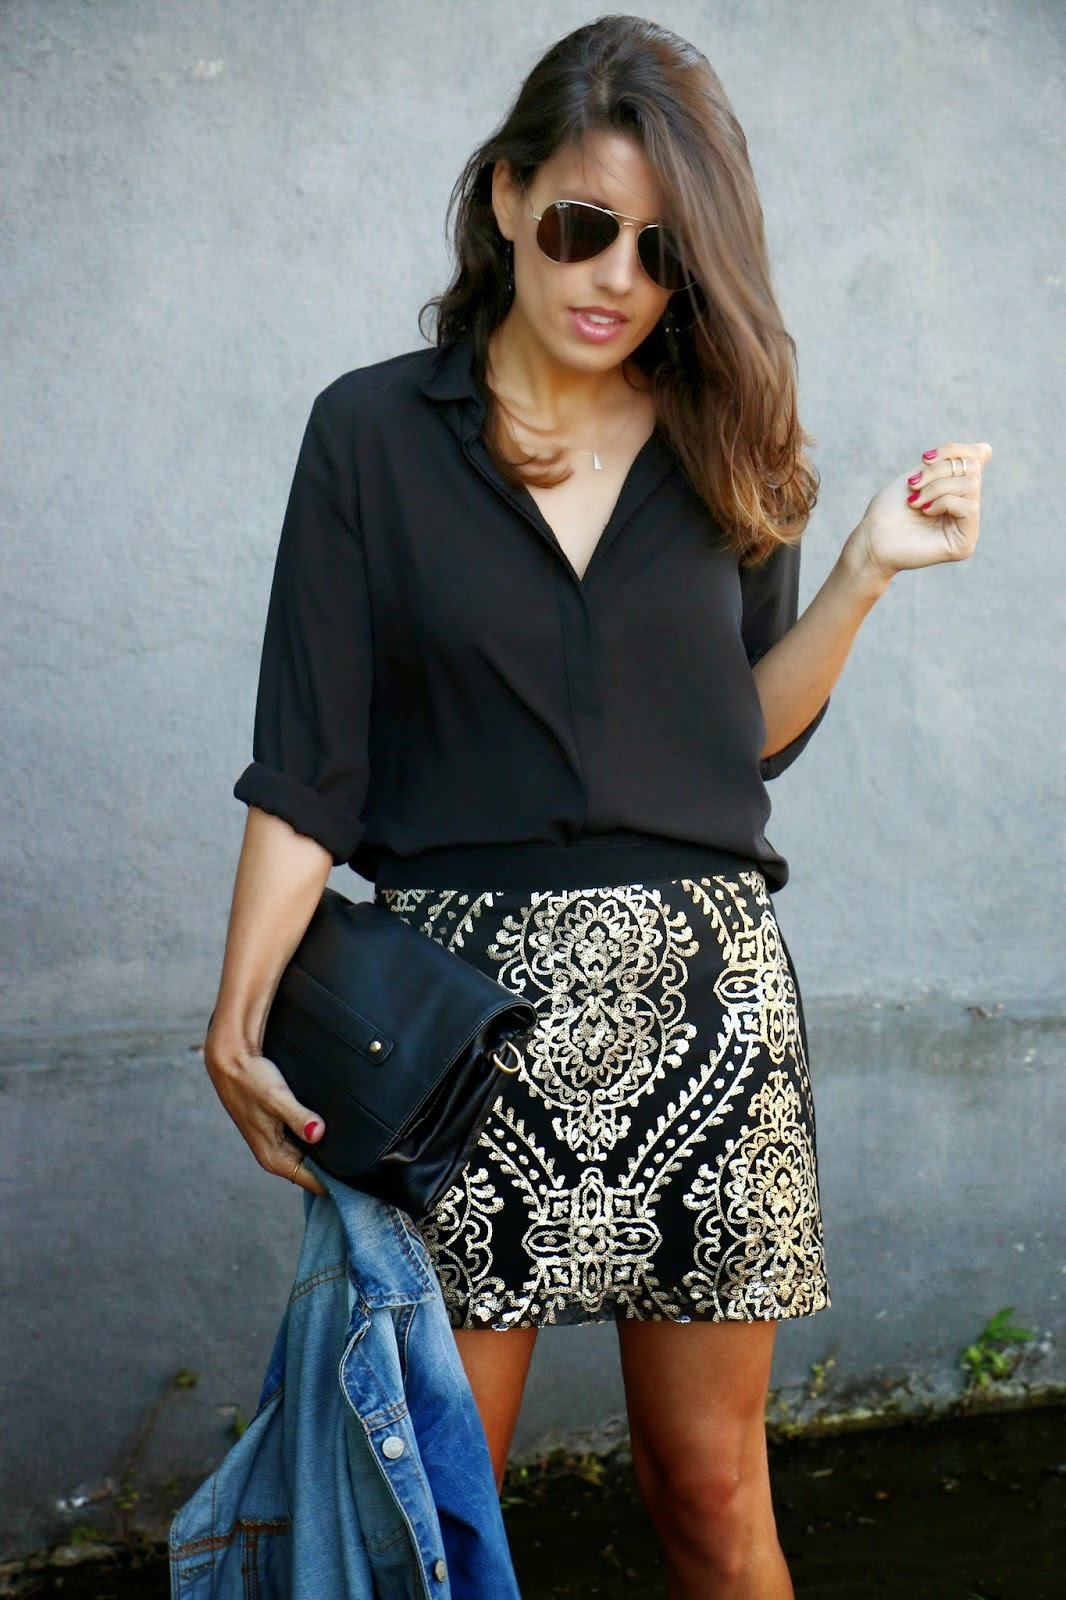 http://ilovefitametrica.blogspot.pt/2014/08/sparkling-skirt.html